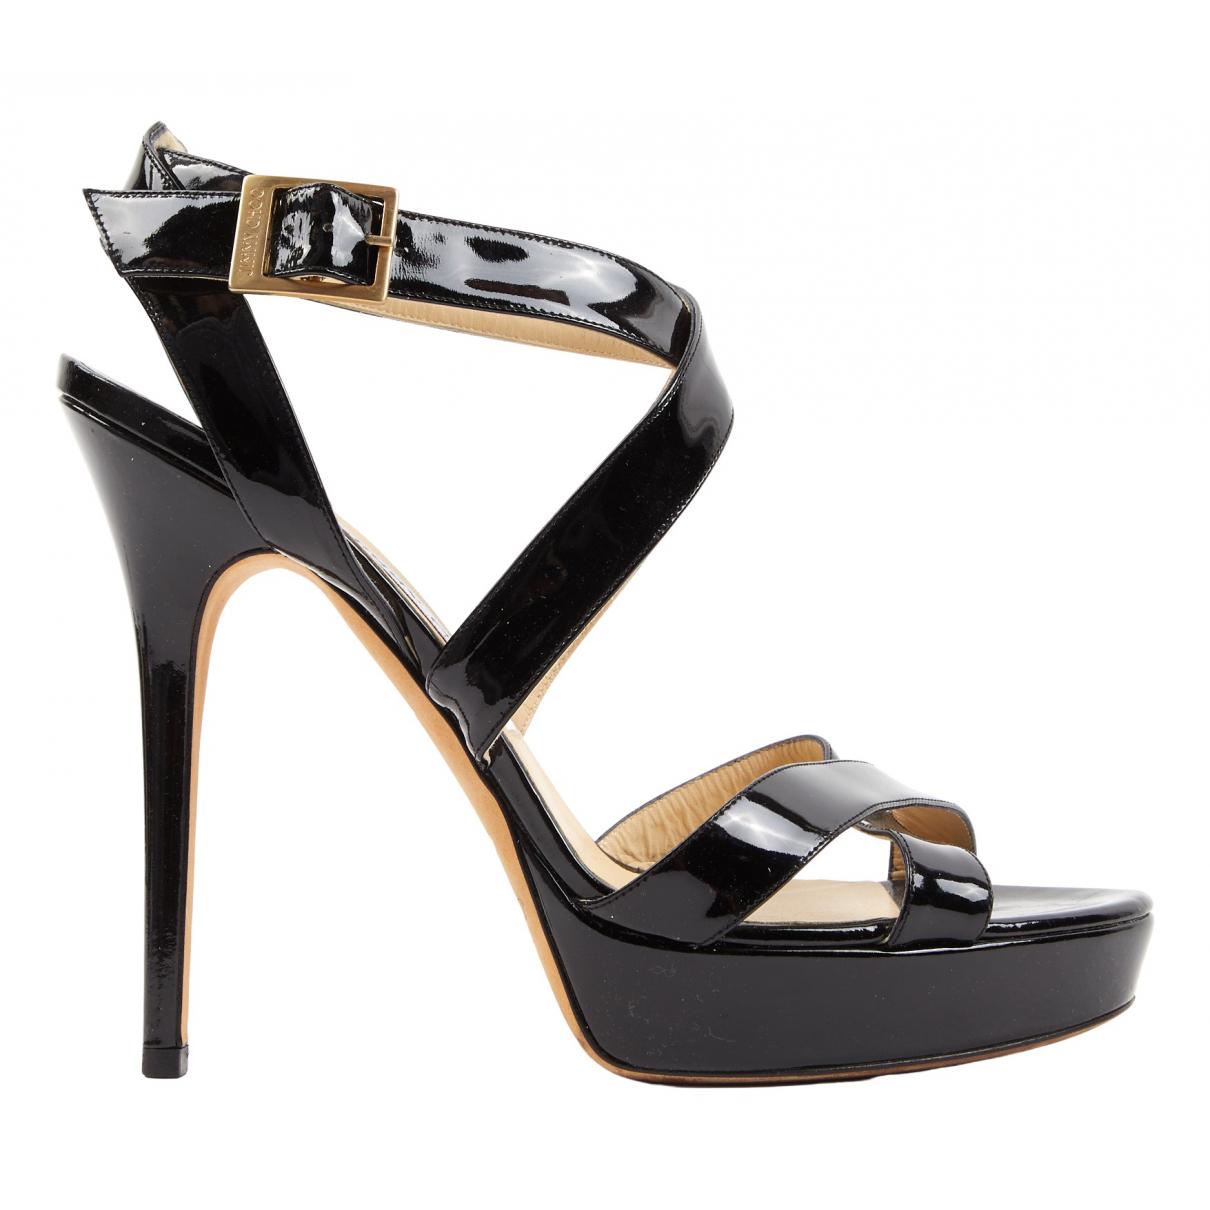 Jimmy Choo N Black Patent leather Sandals for Women 40 EU